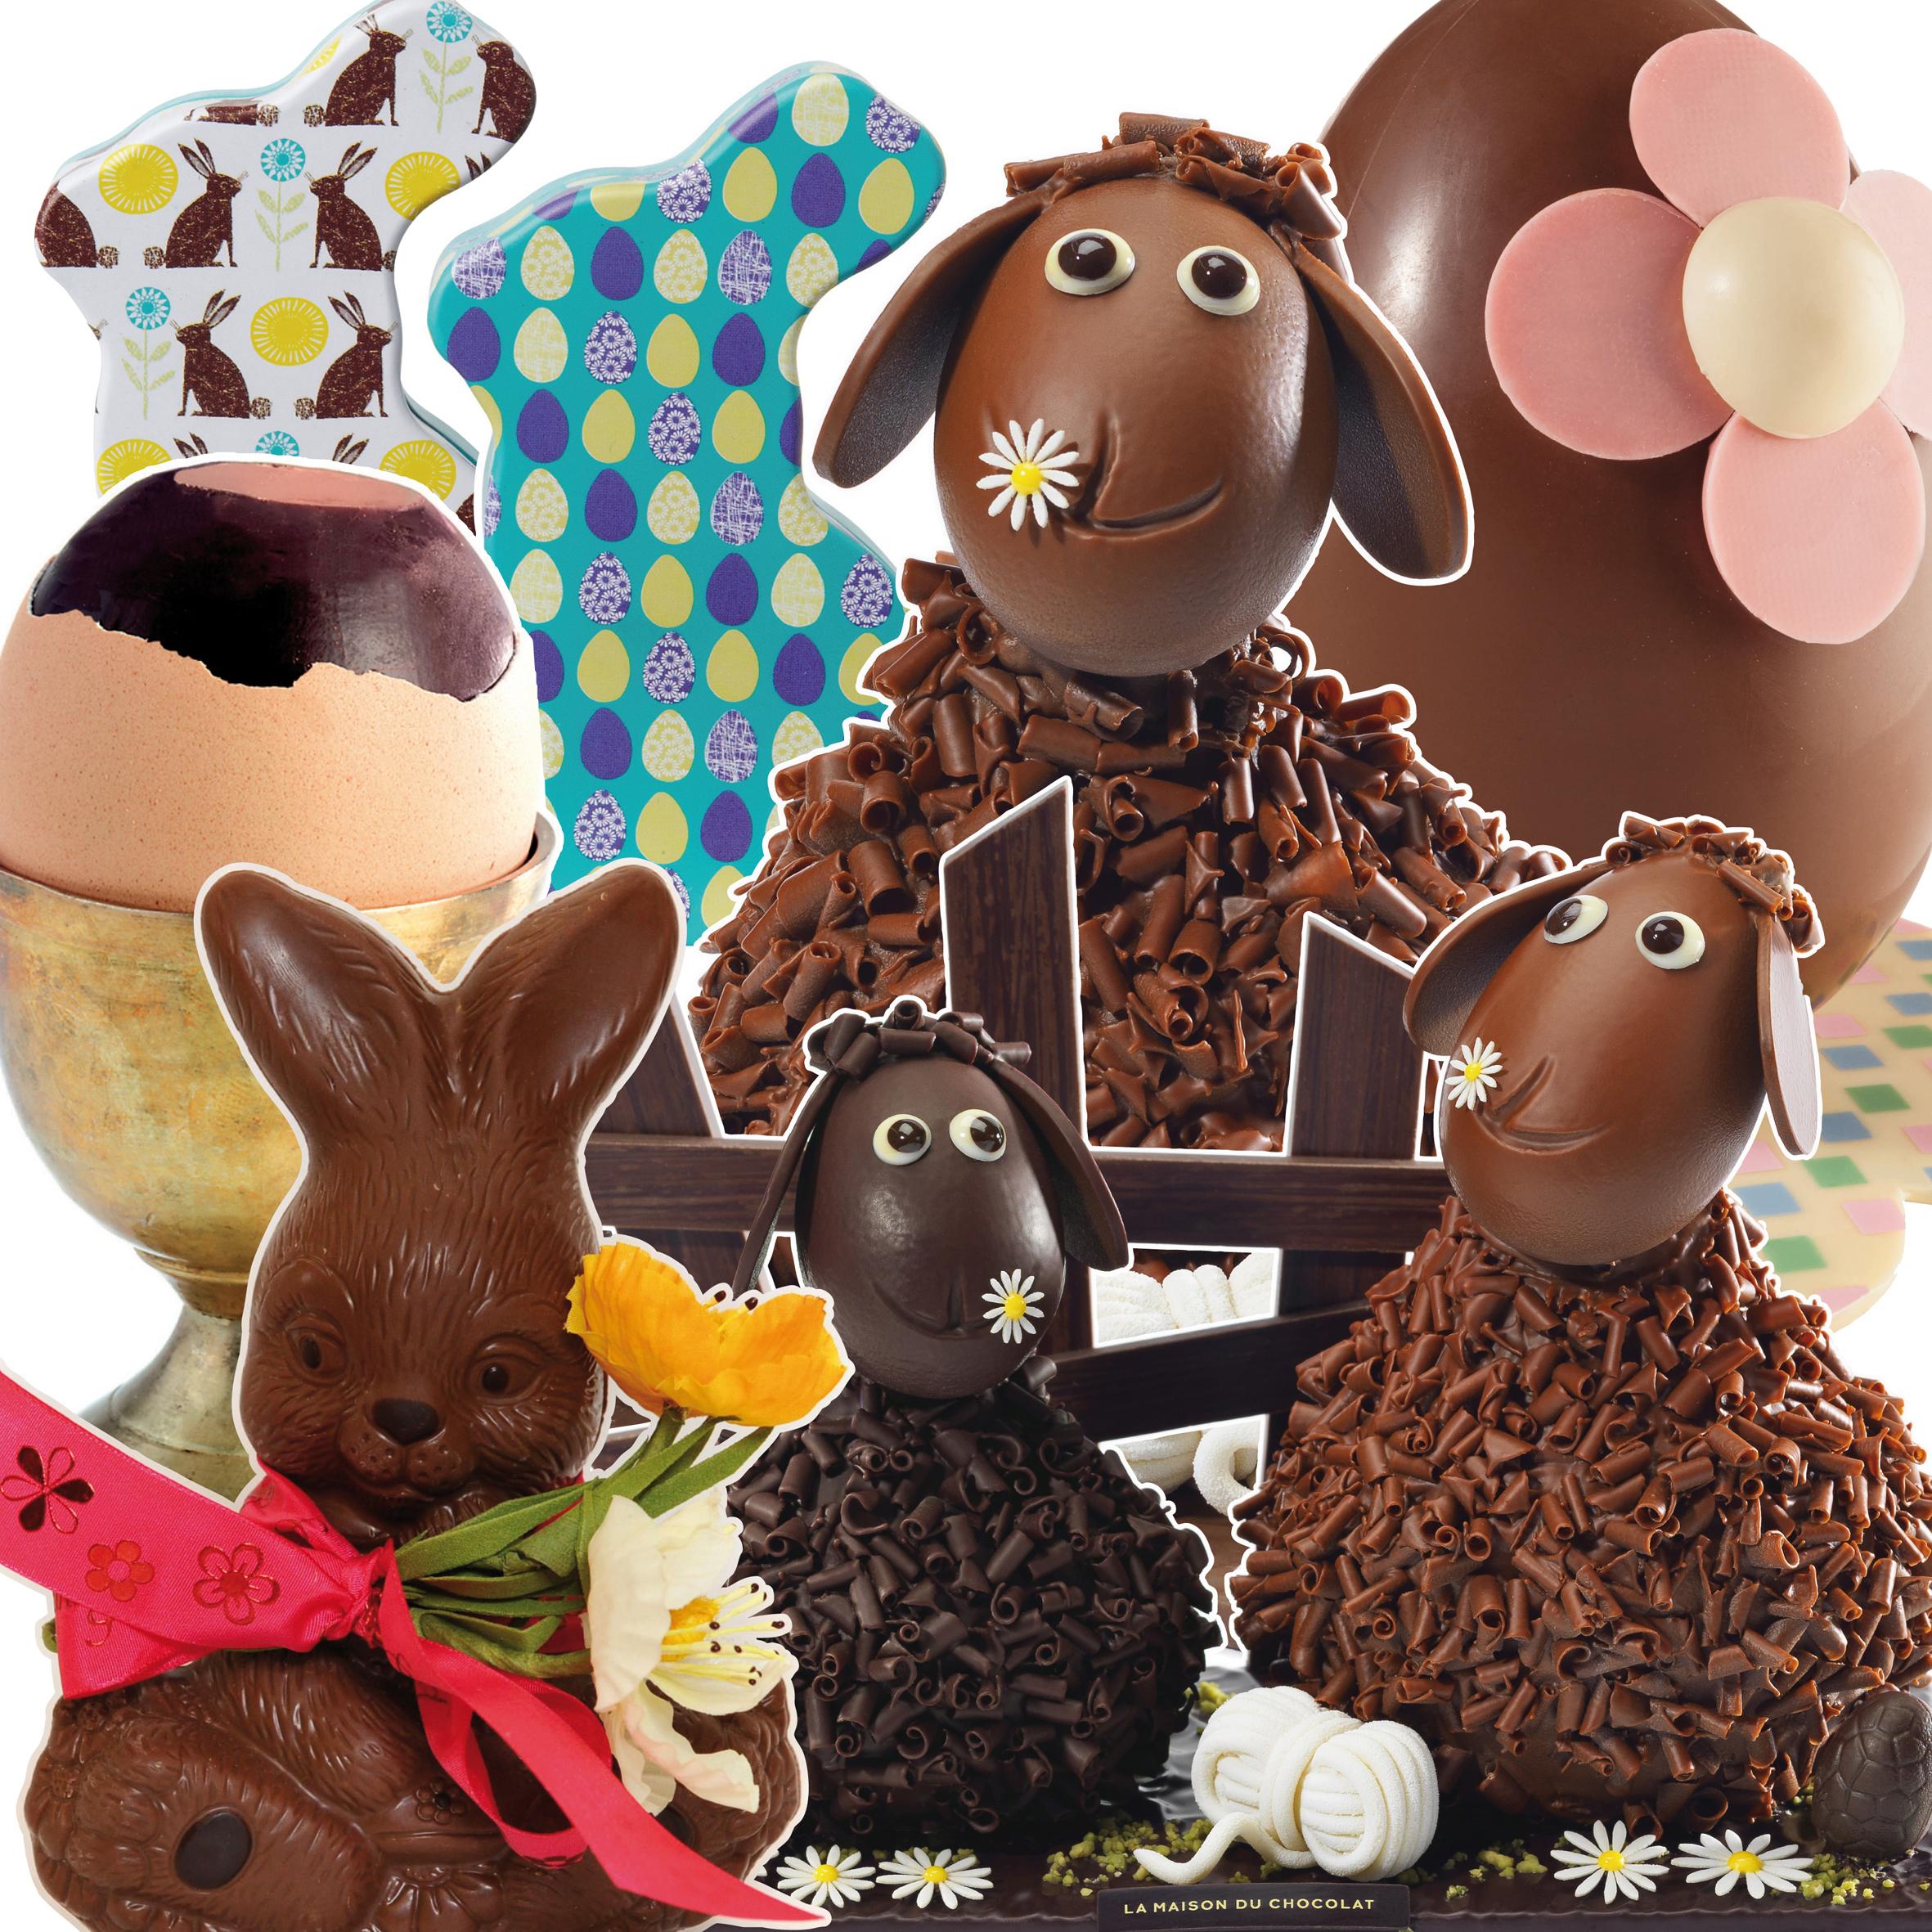 chocolat_paques_2013-3